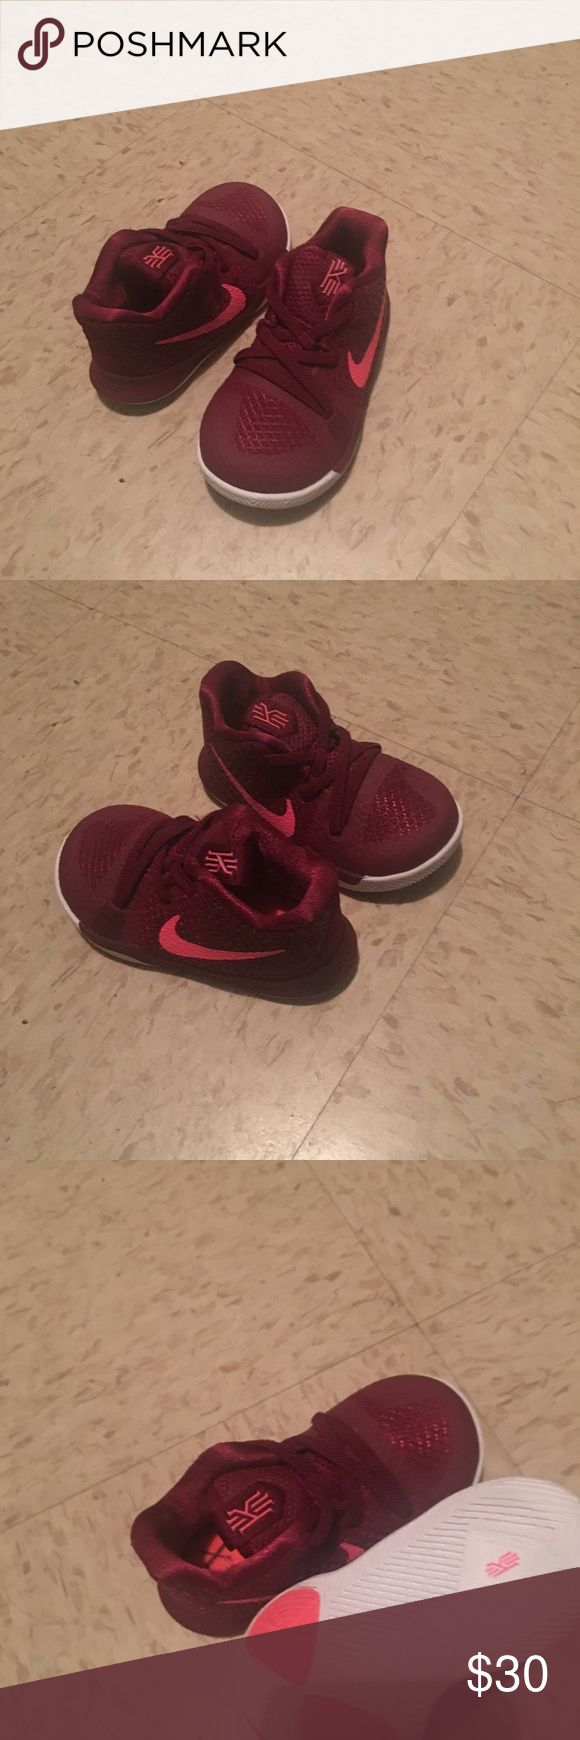 Sneakers Kyrie sneakers Kyrie's Shoes Sneakers